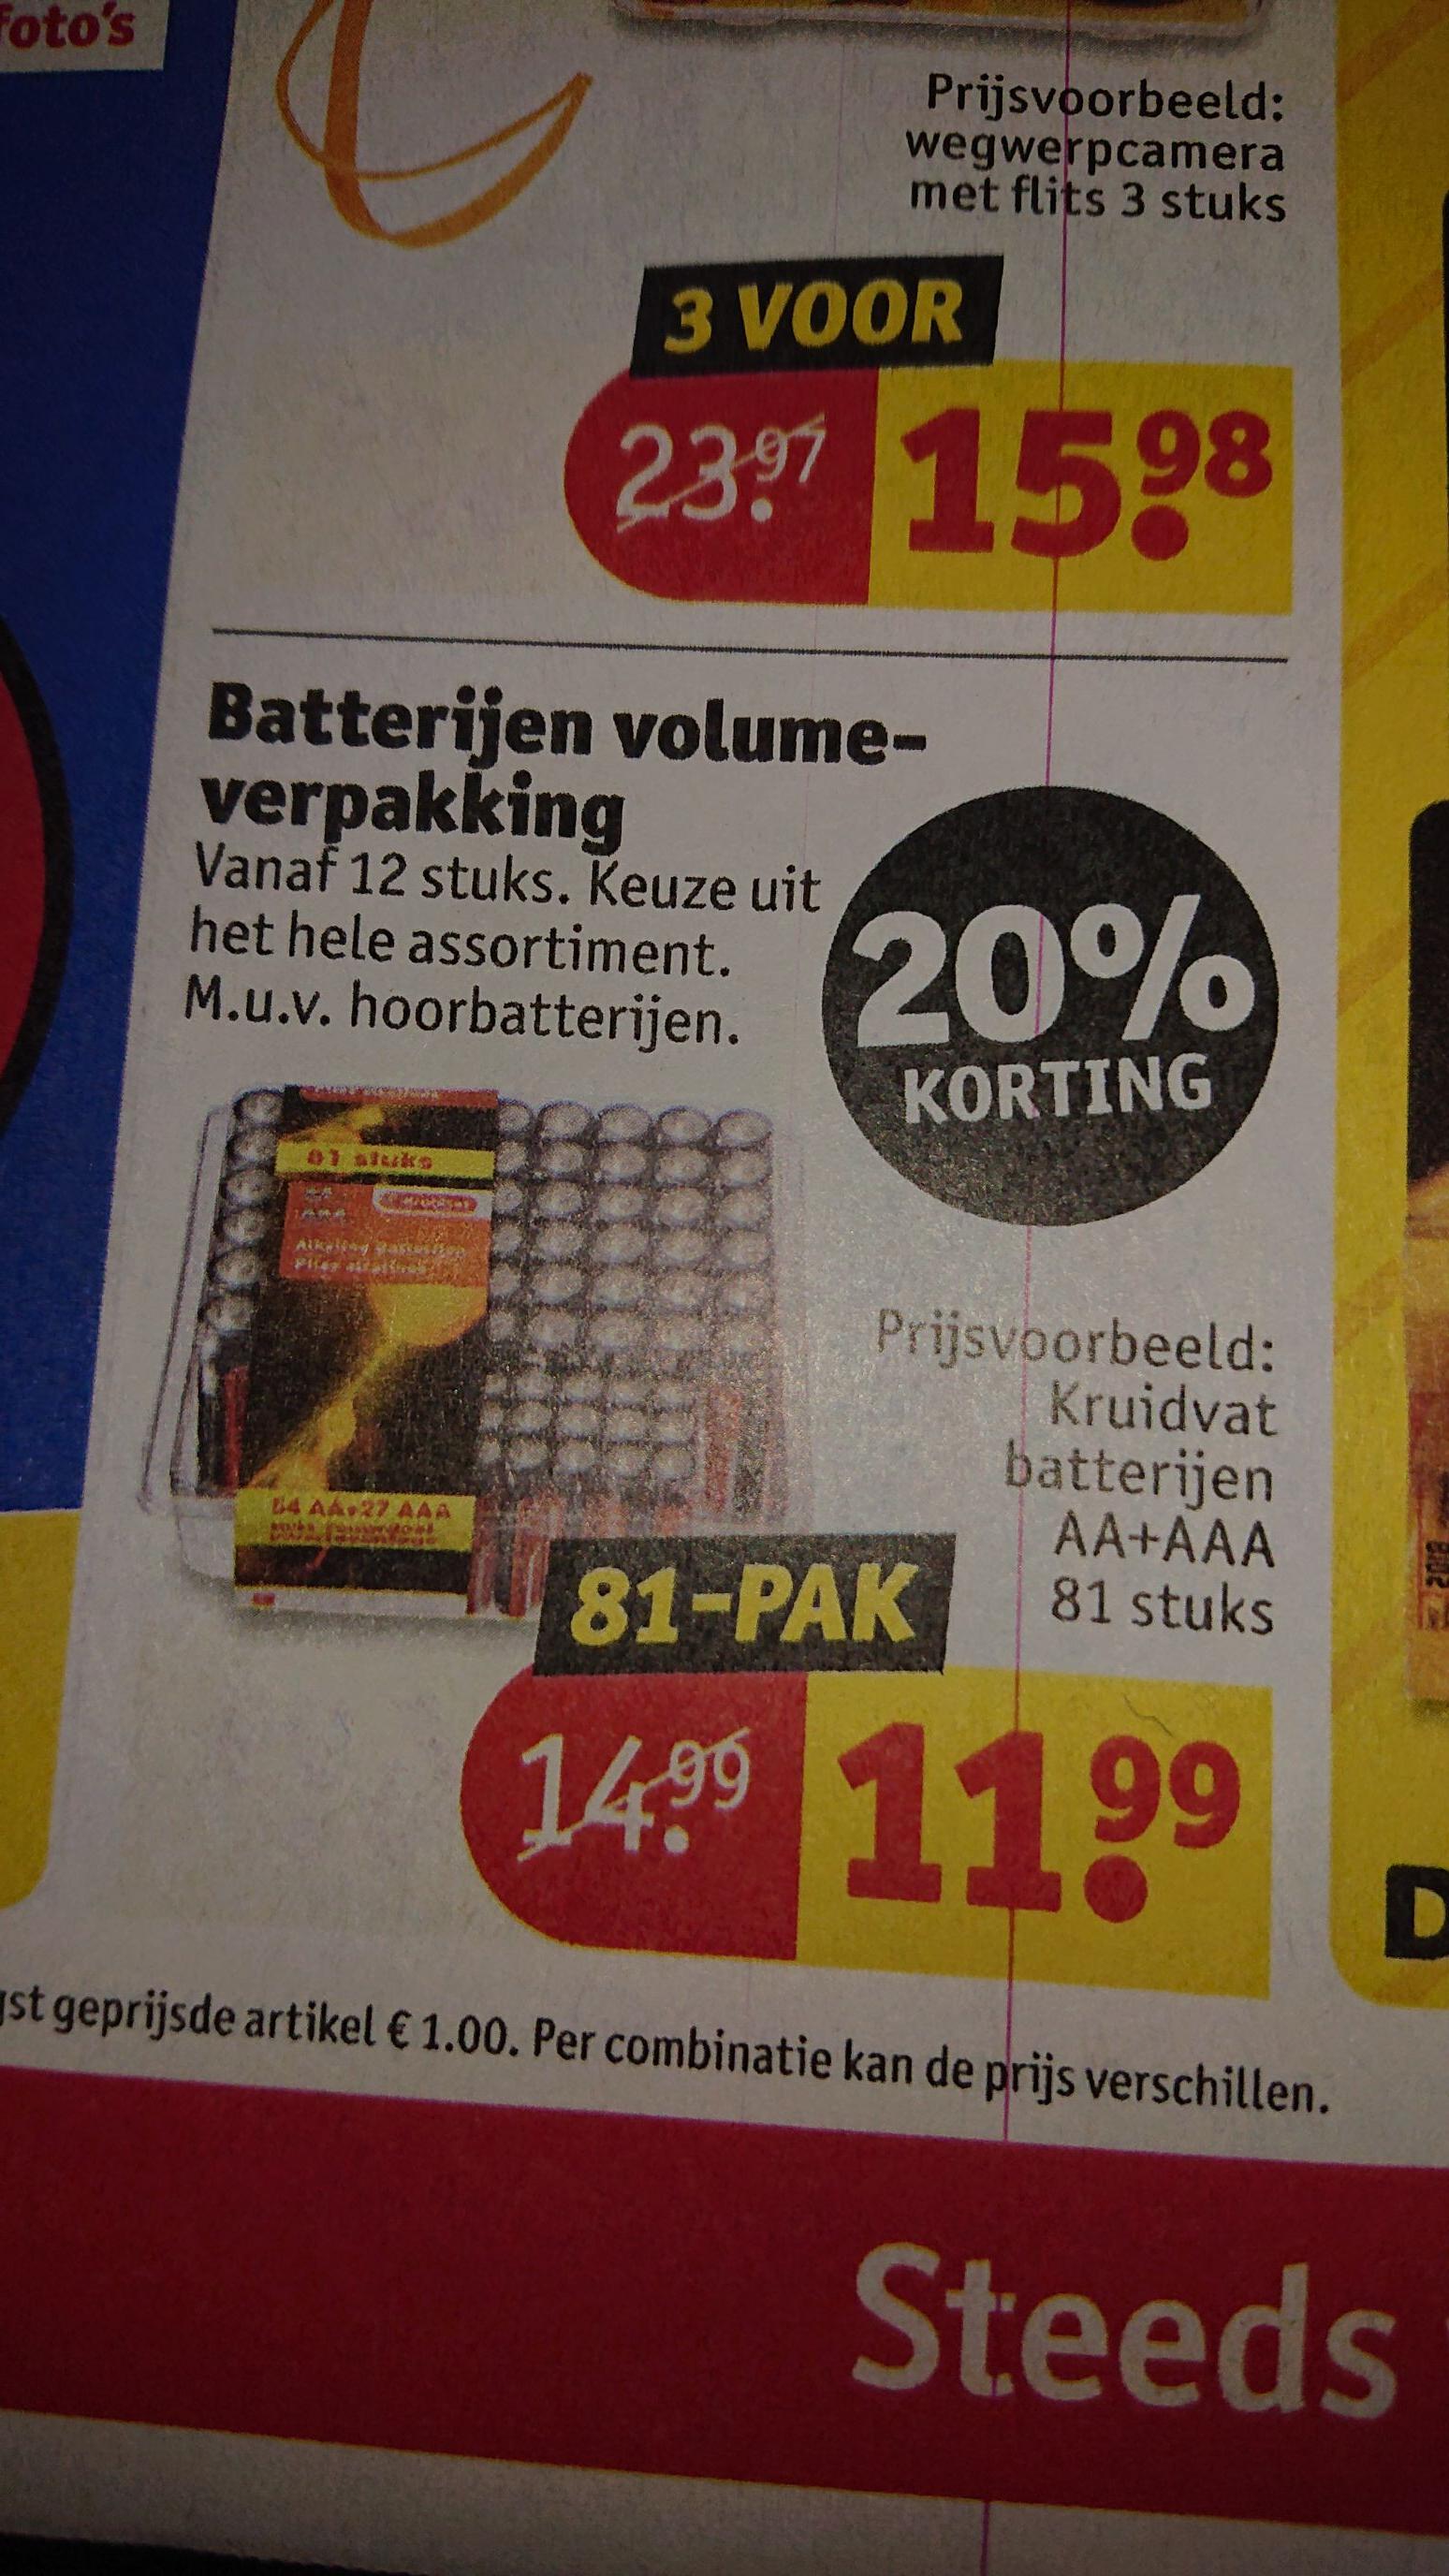 Kruidvat AA en AAA Batterijen Multipak 81 pak  20% korting van 14, 99 voor 11,99